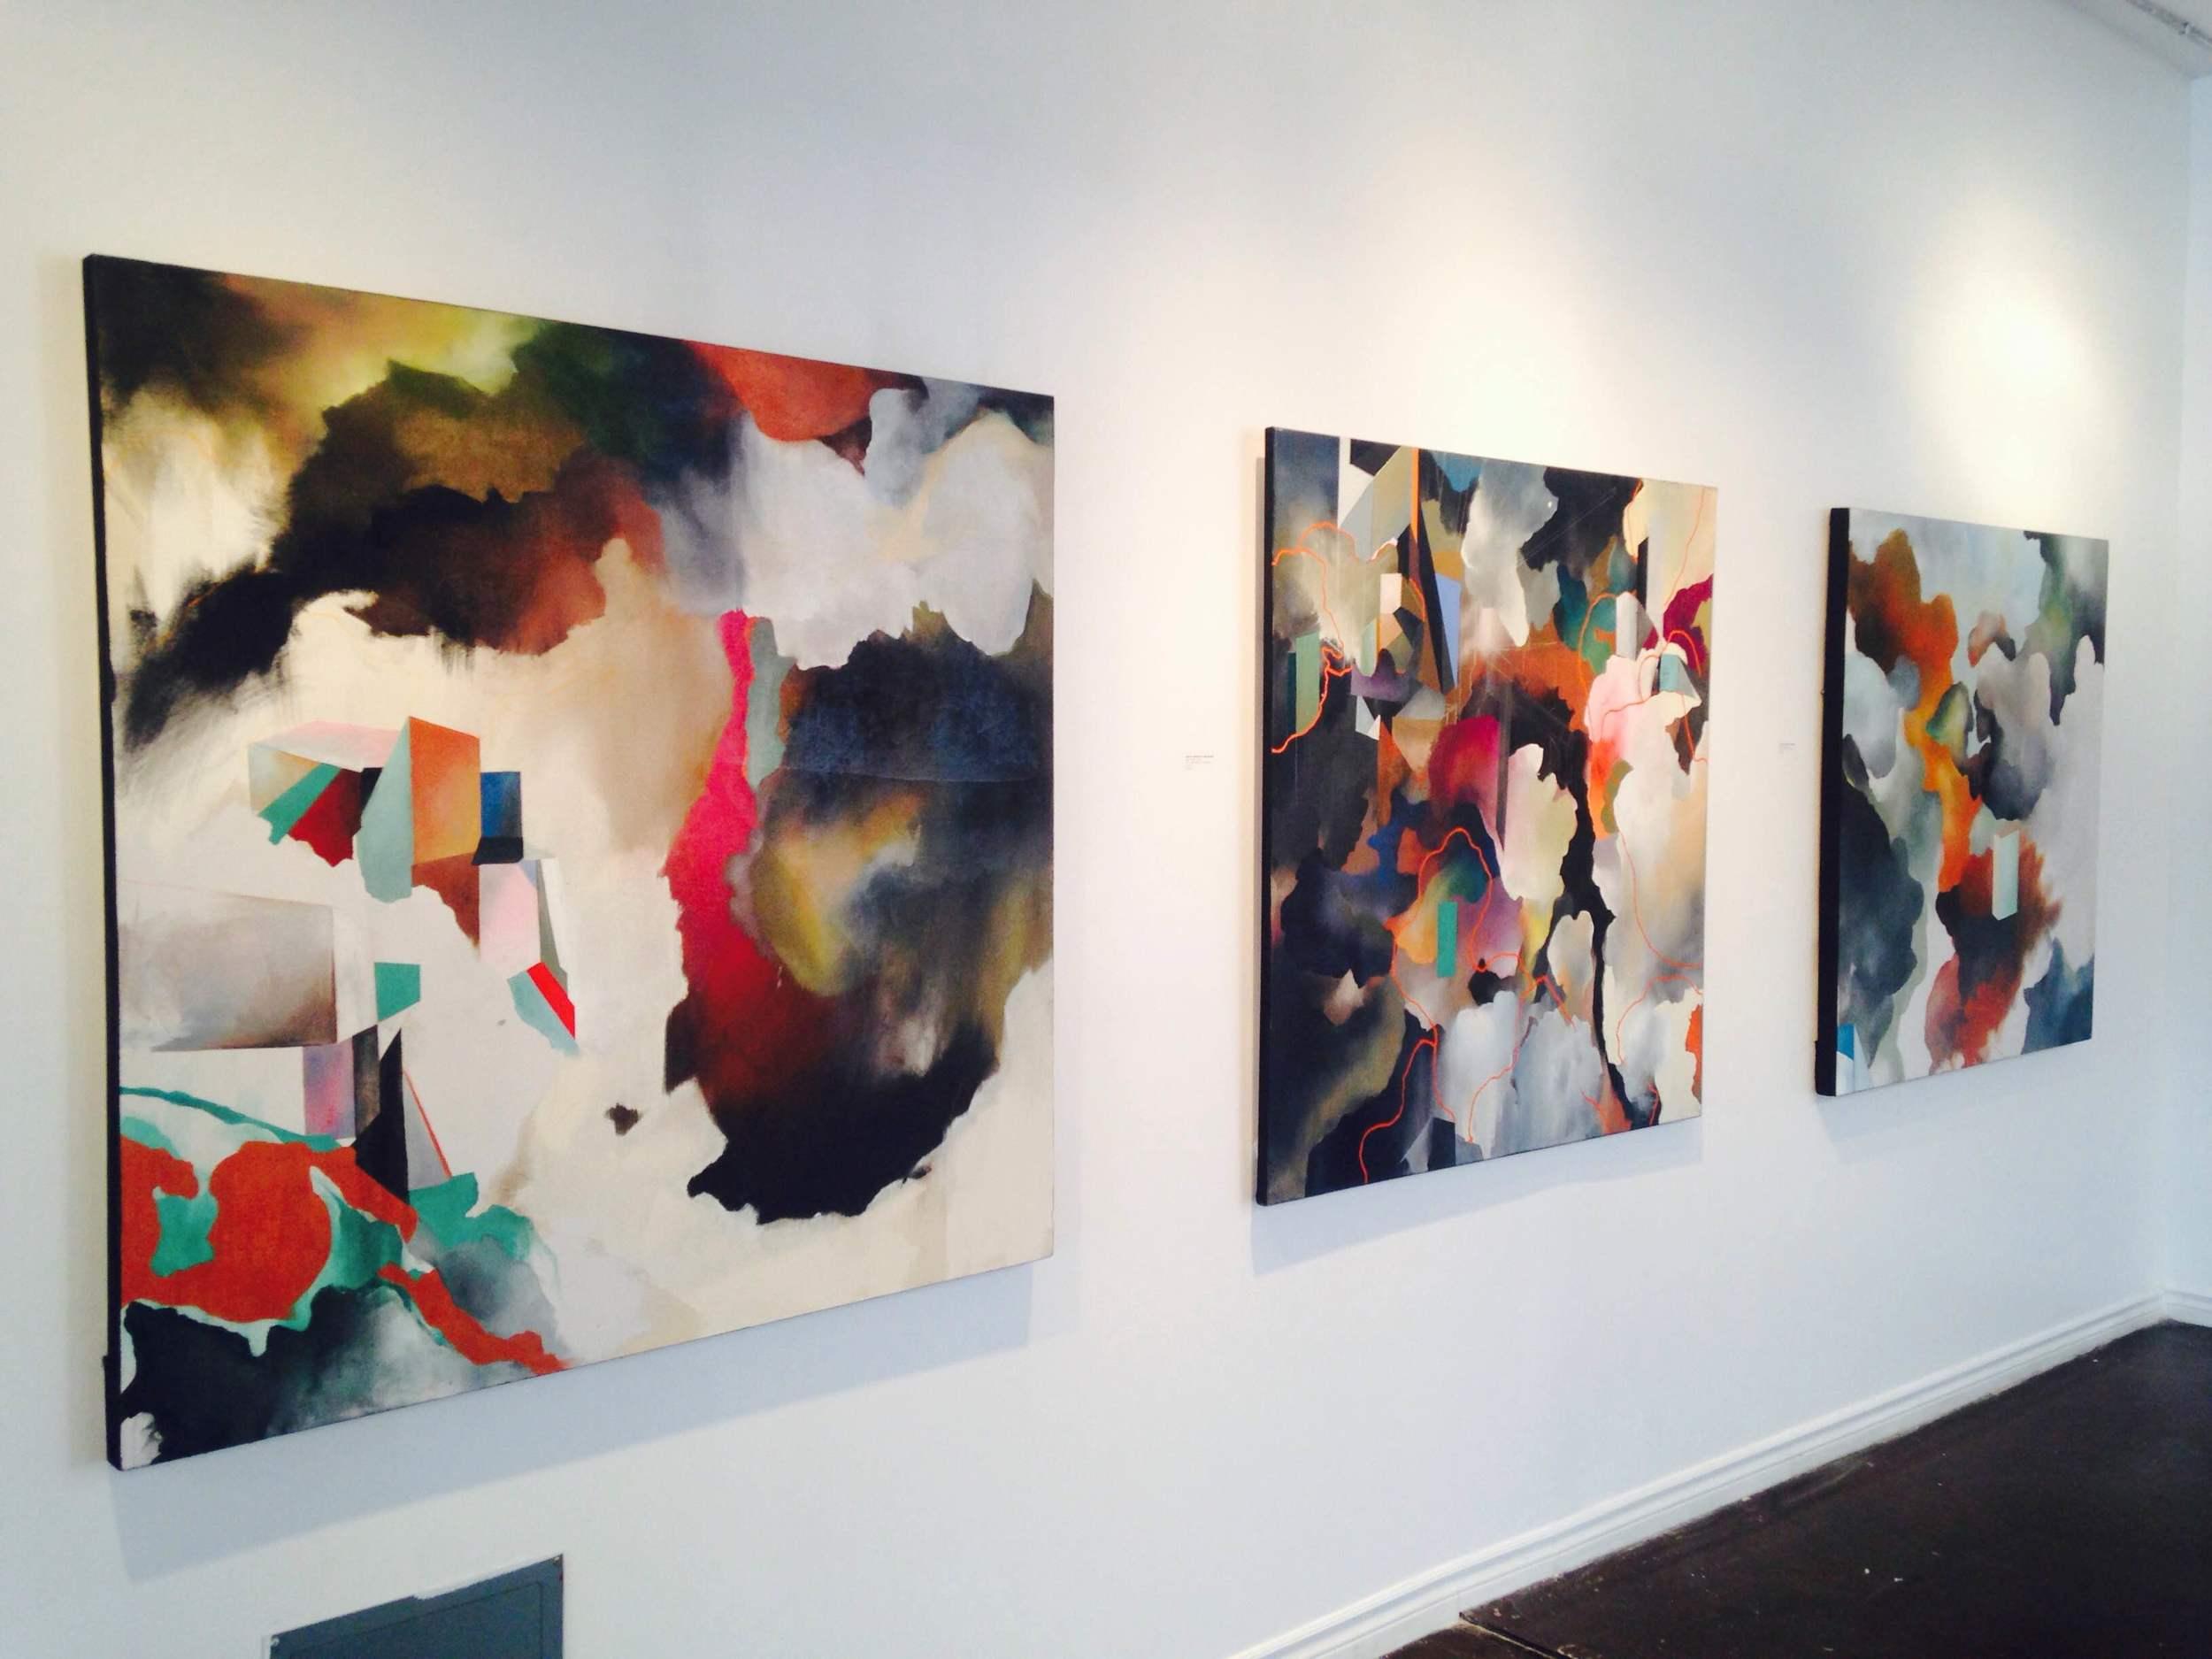 Works by Annie Bradford Metheany